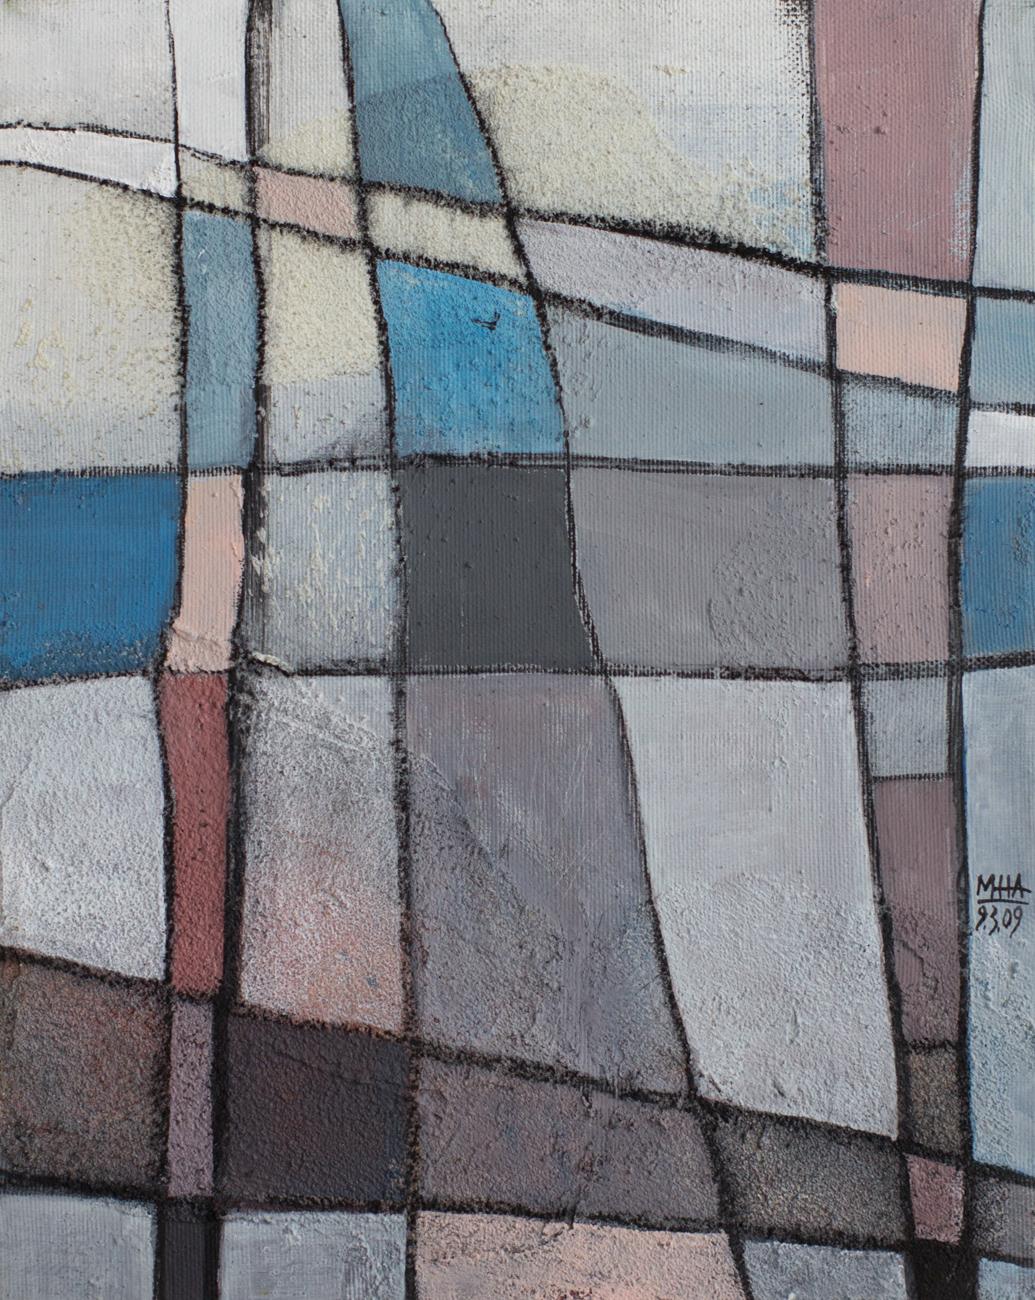 Fantasie in Linien 4 , 2009,Acryl auf Leinwand, 24x30 cm